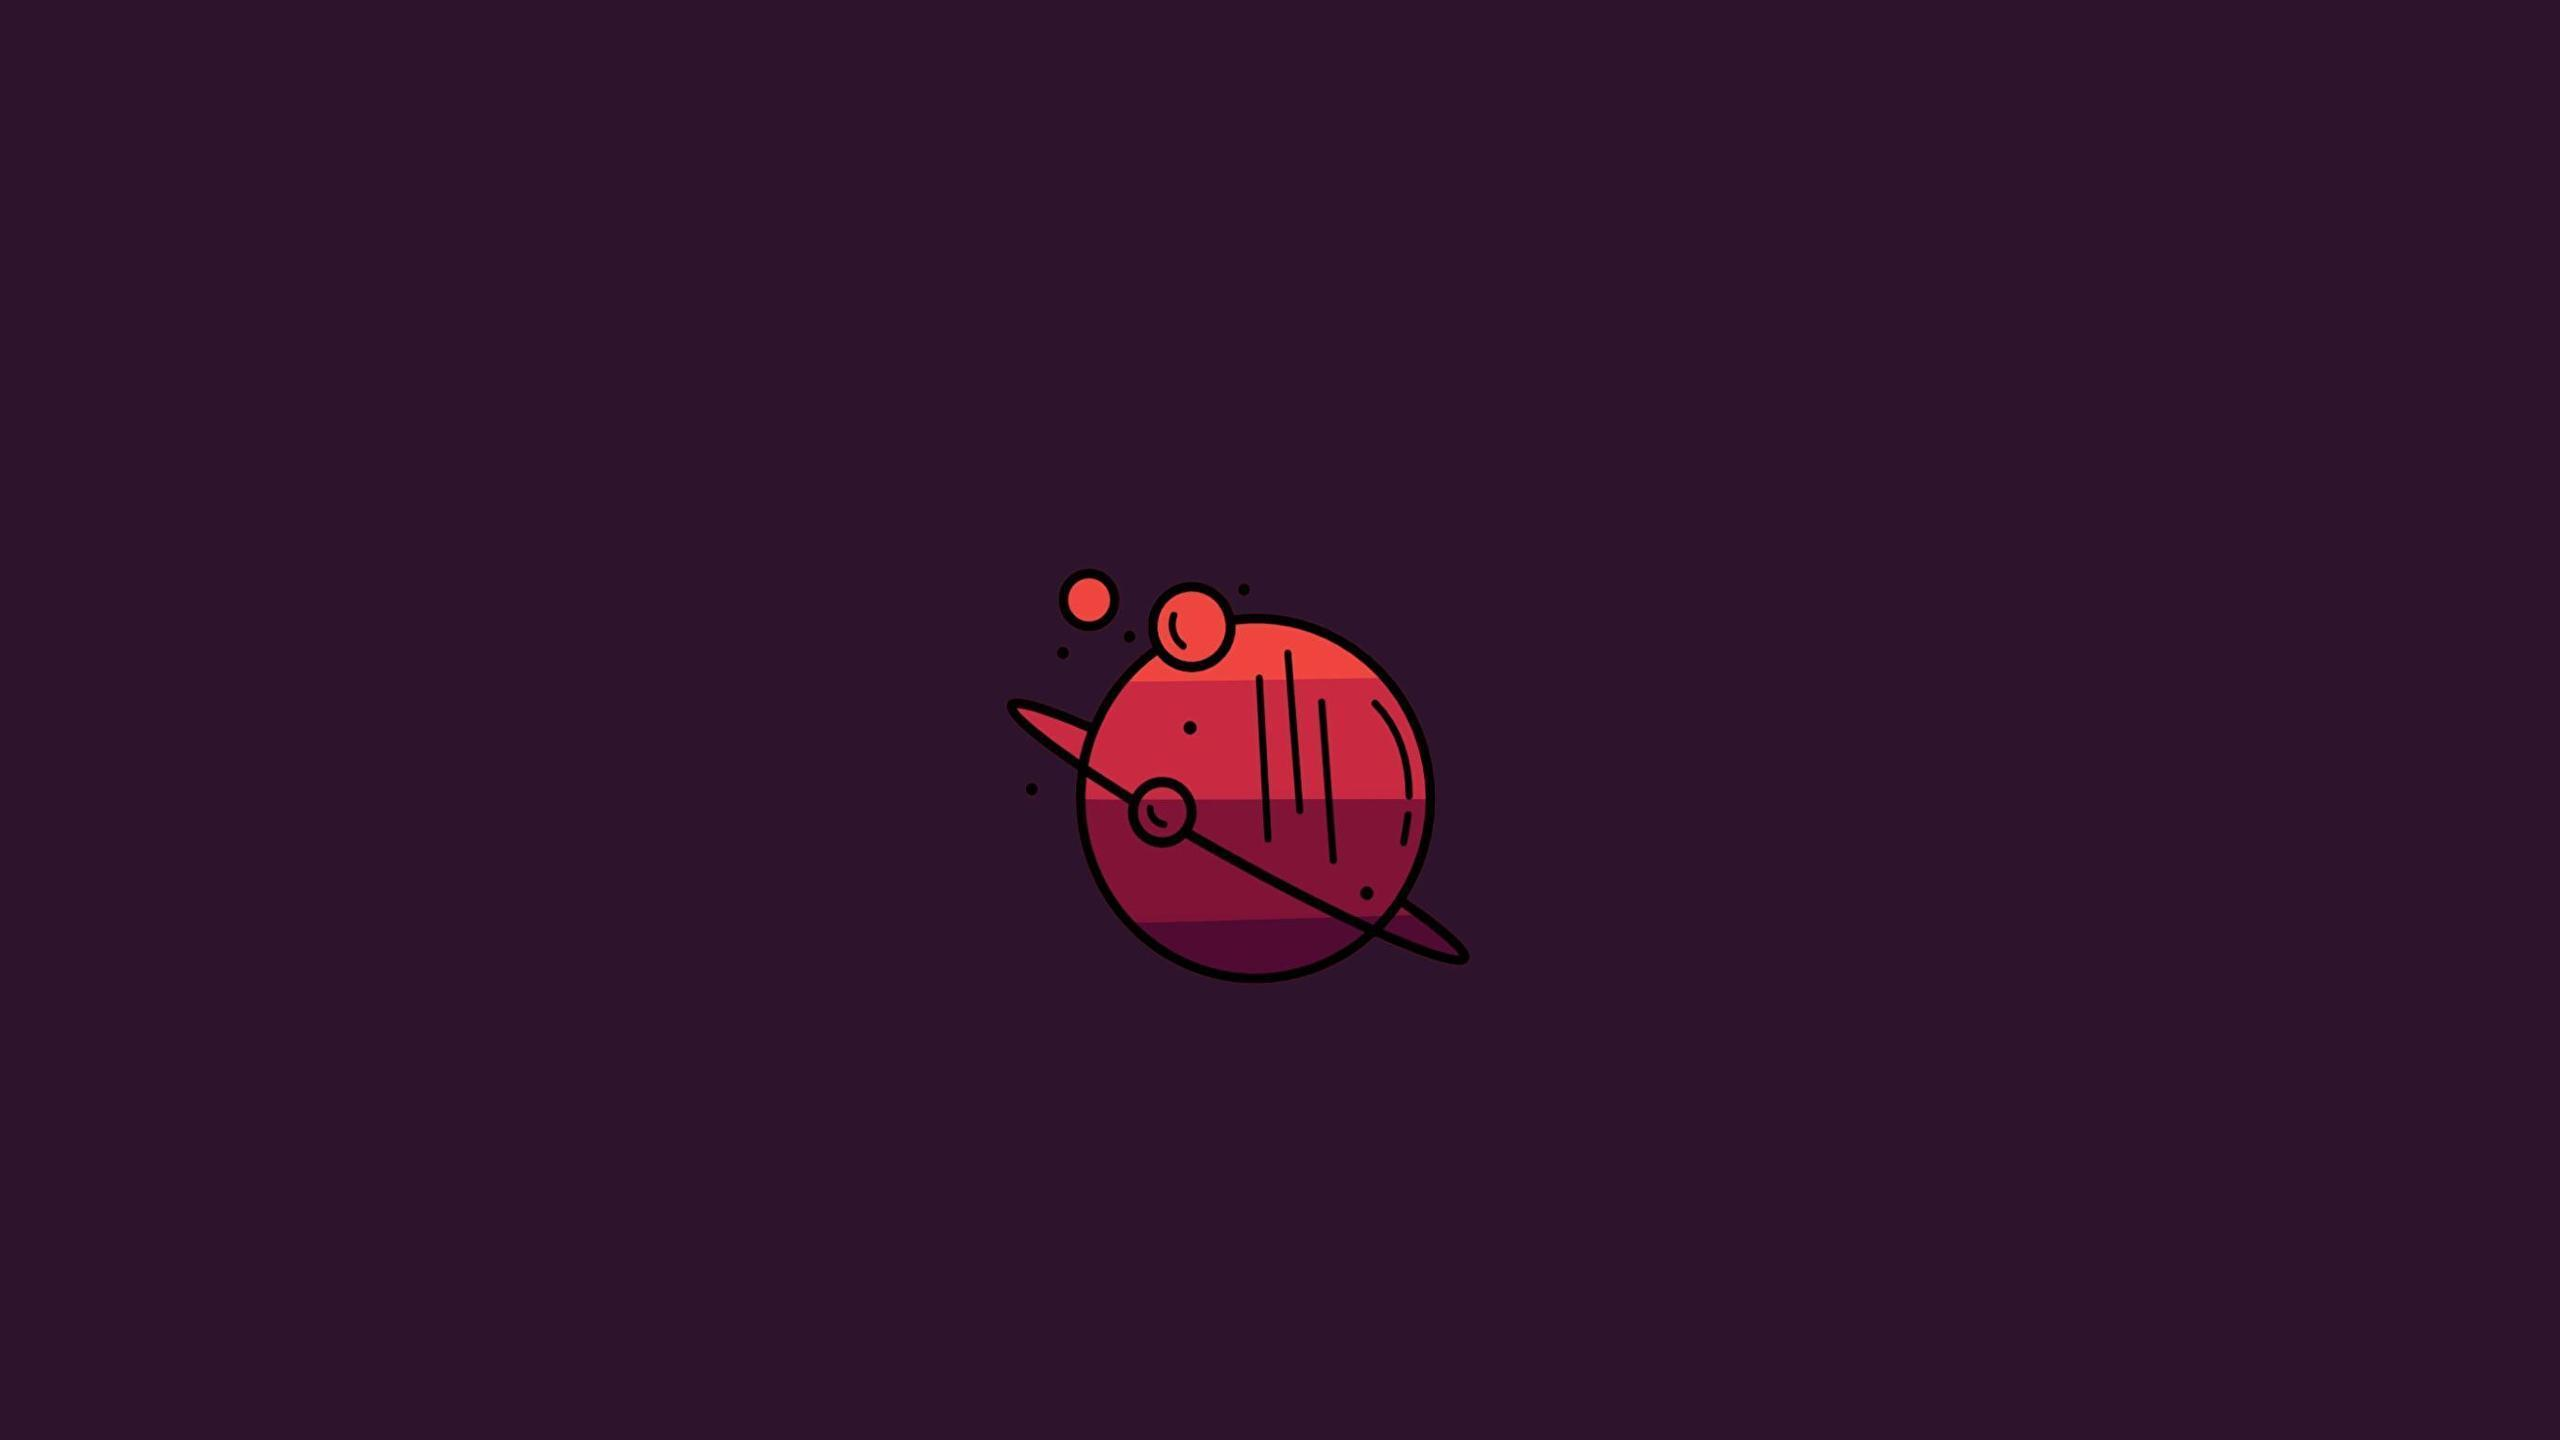 2560x1440 Minimal Planet Red Background 1440P Resolution ...